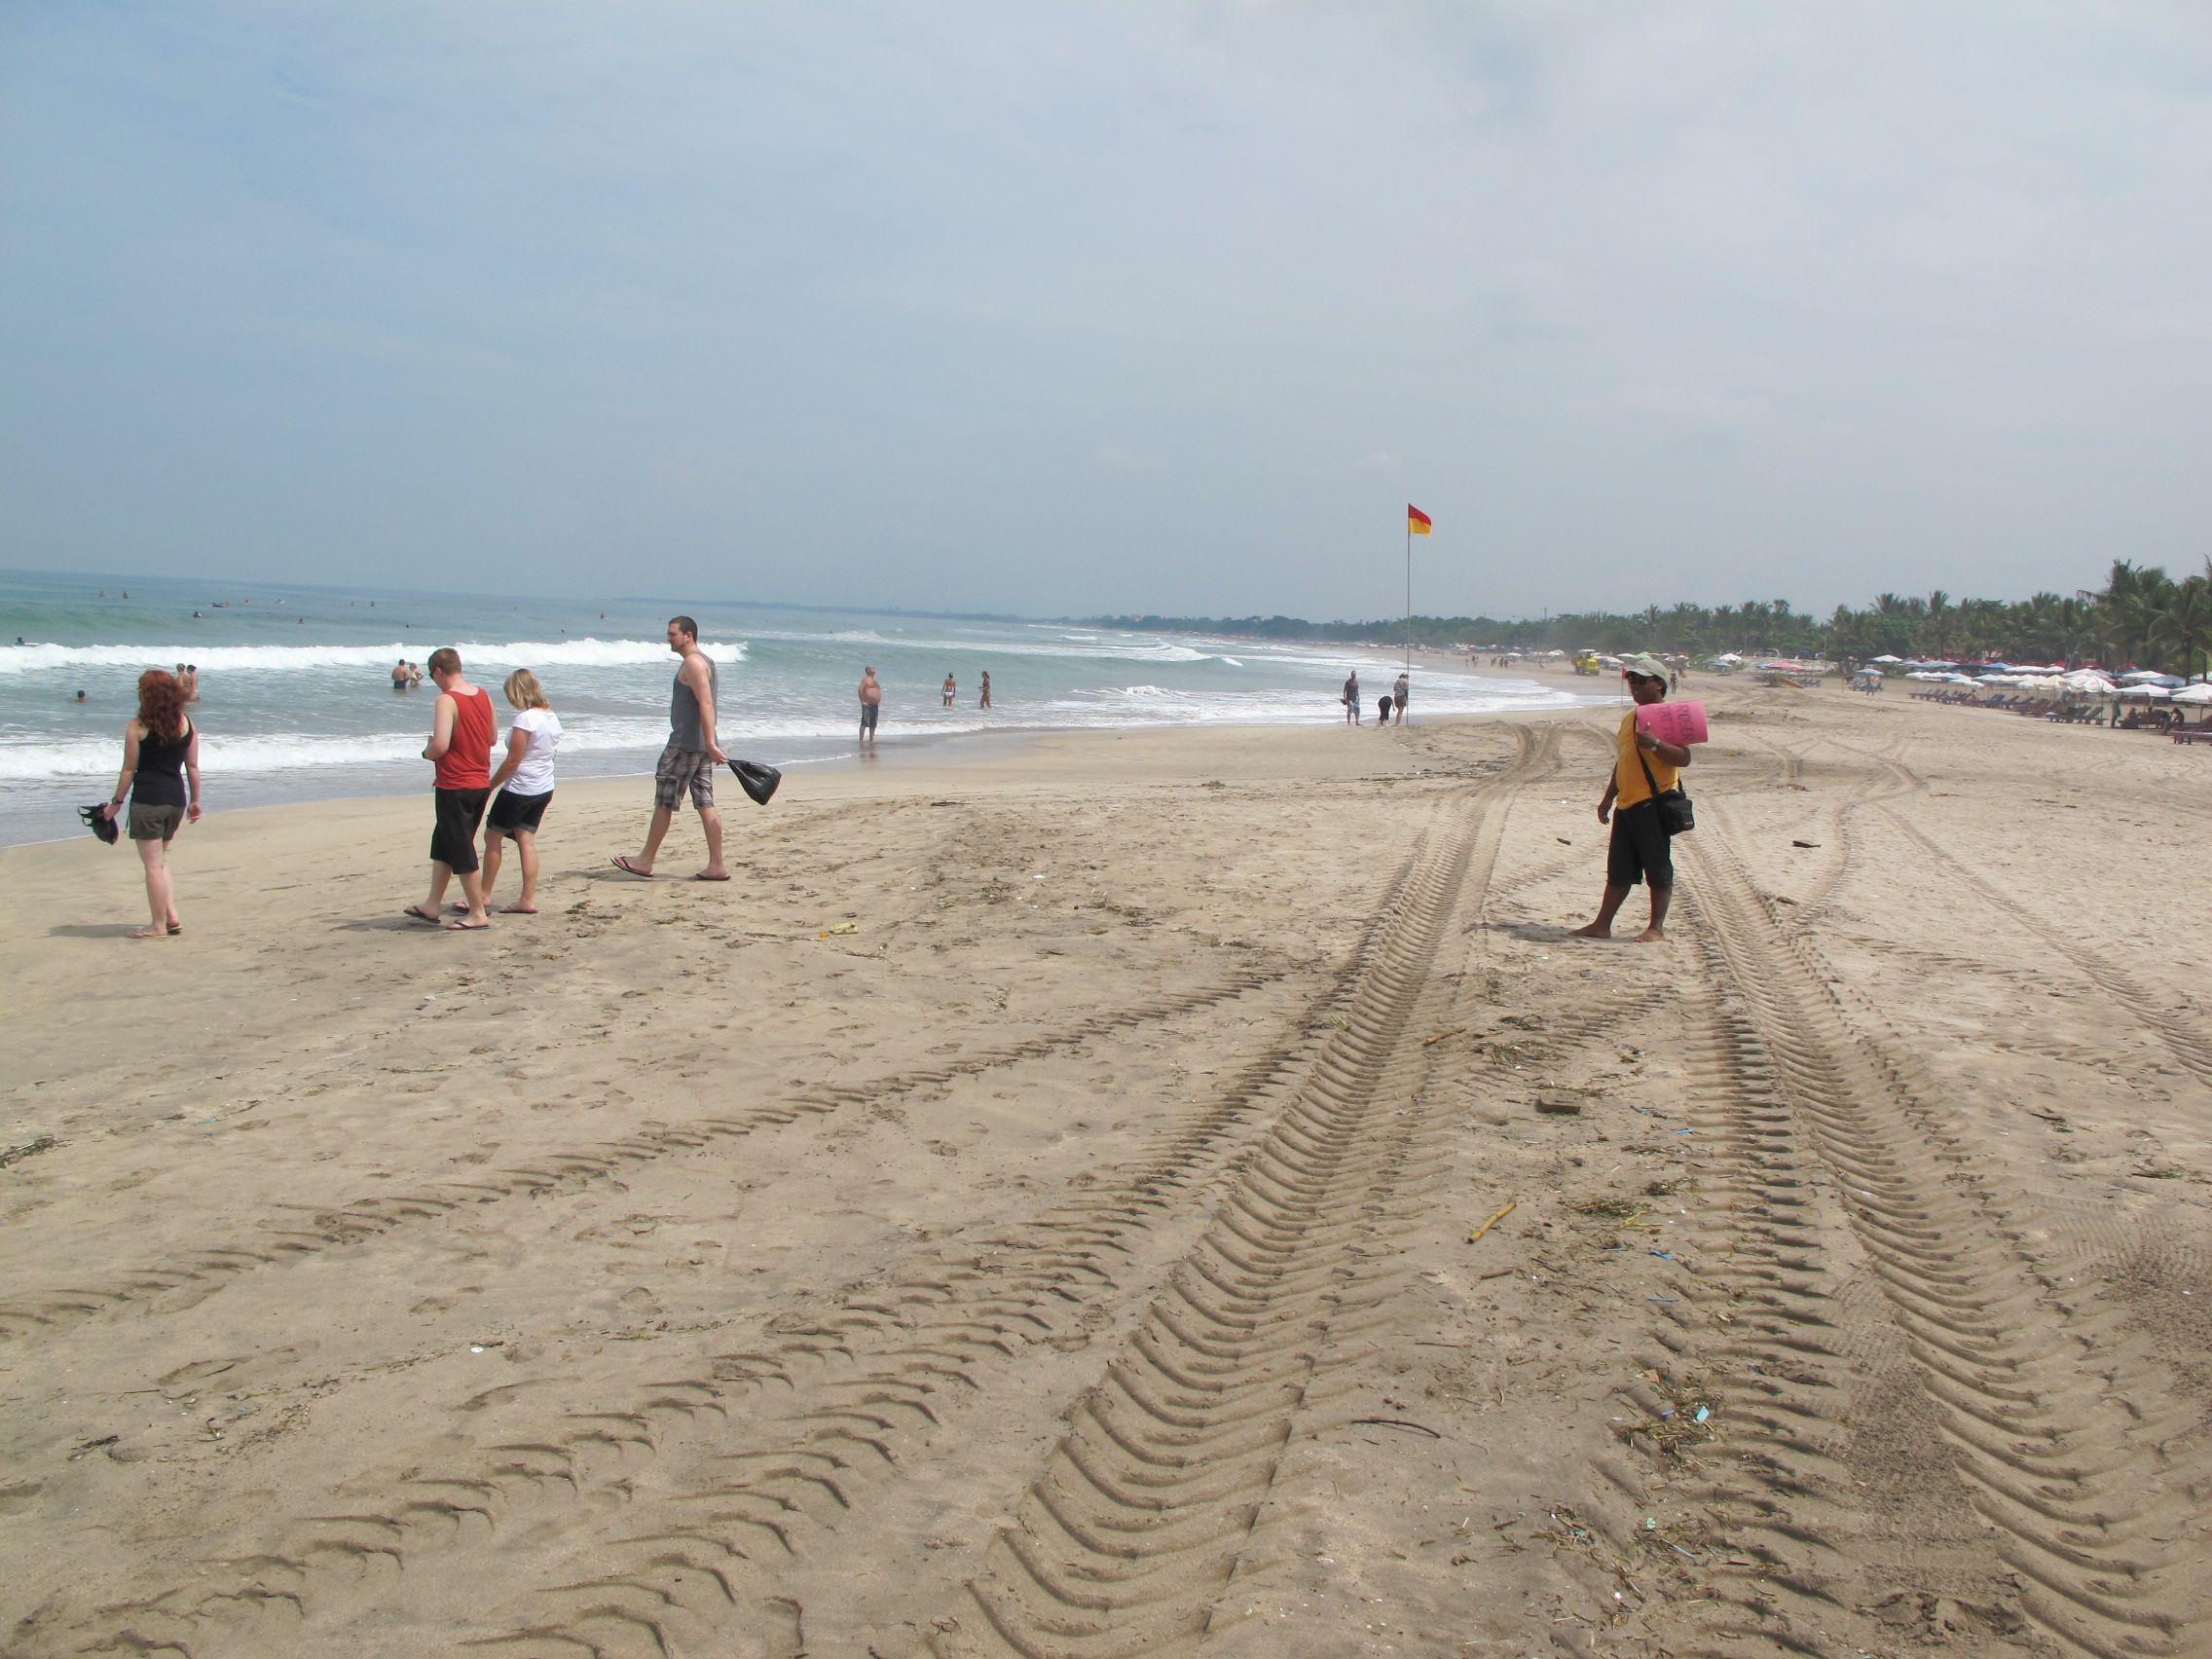 The beach in, Kuta, Bali